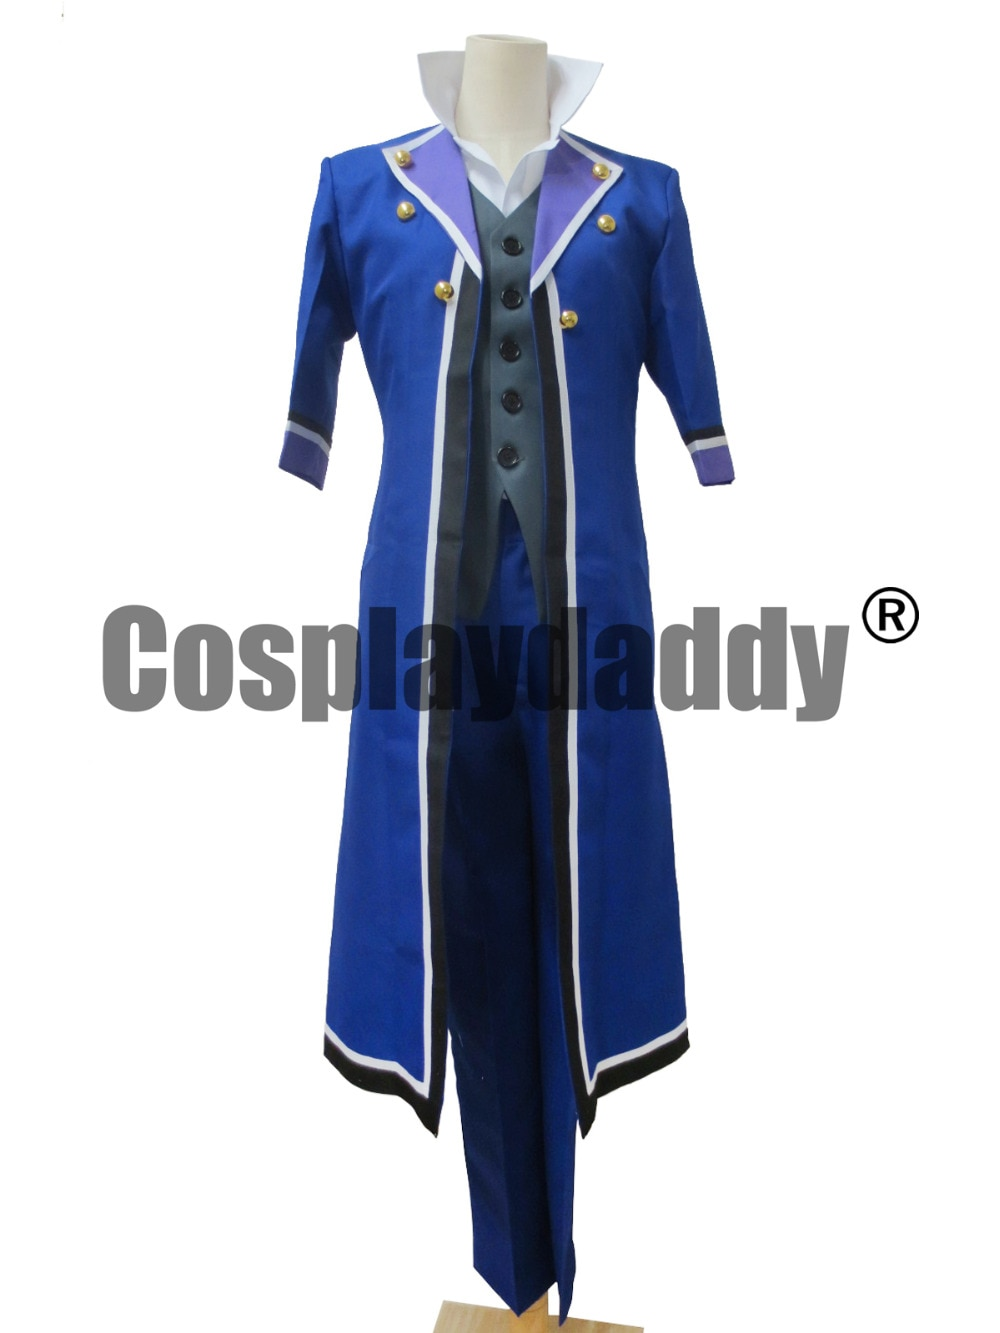 Anime japonés K Project Saruhiko Fushimi Cosplay disfraces nuevo traje